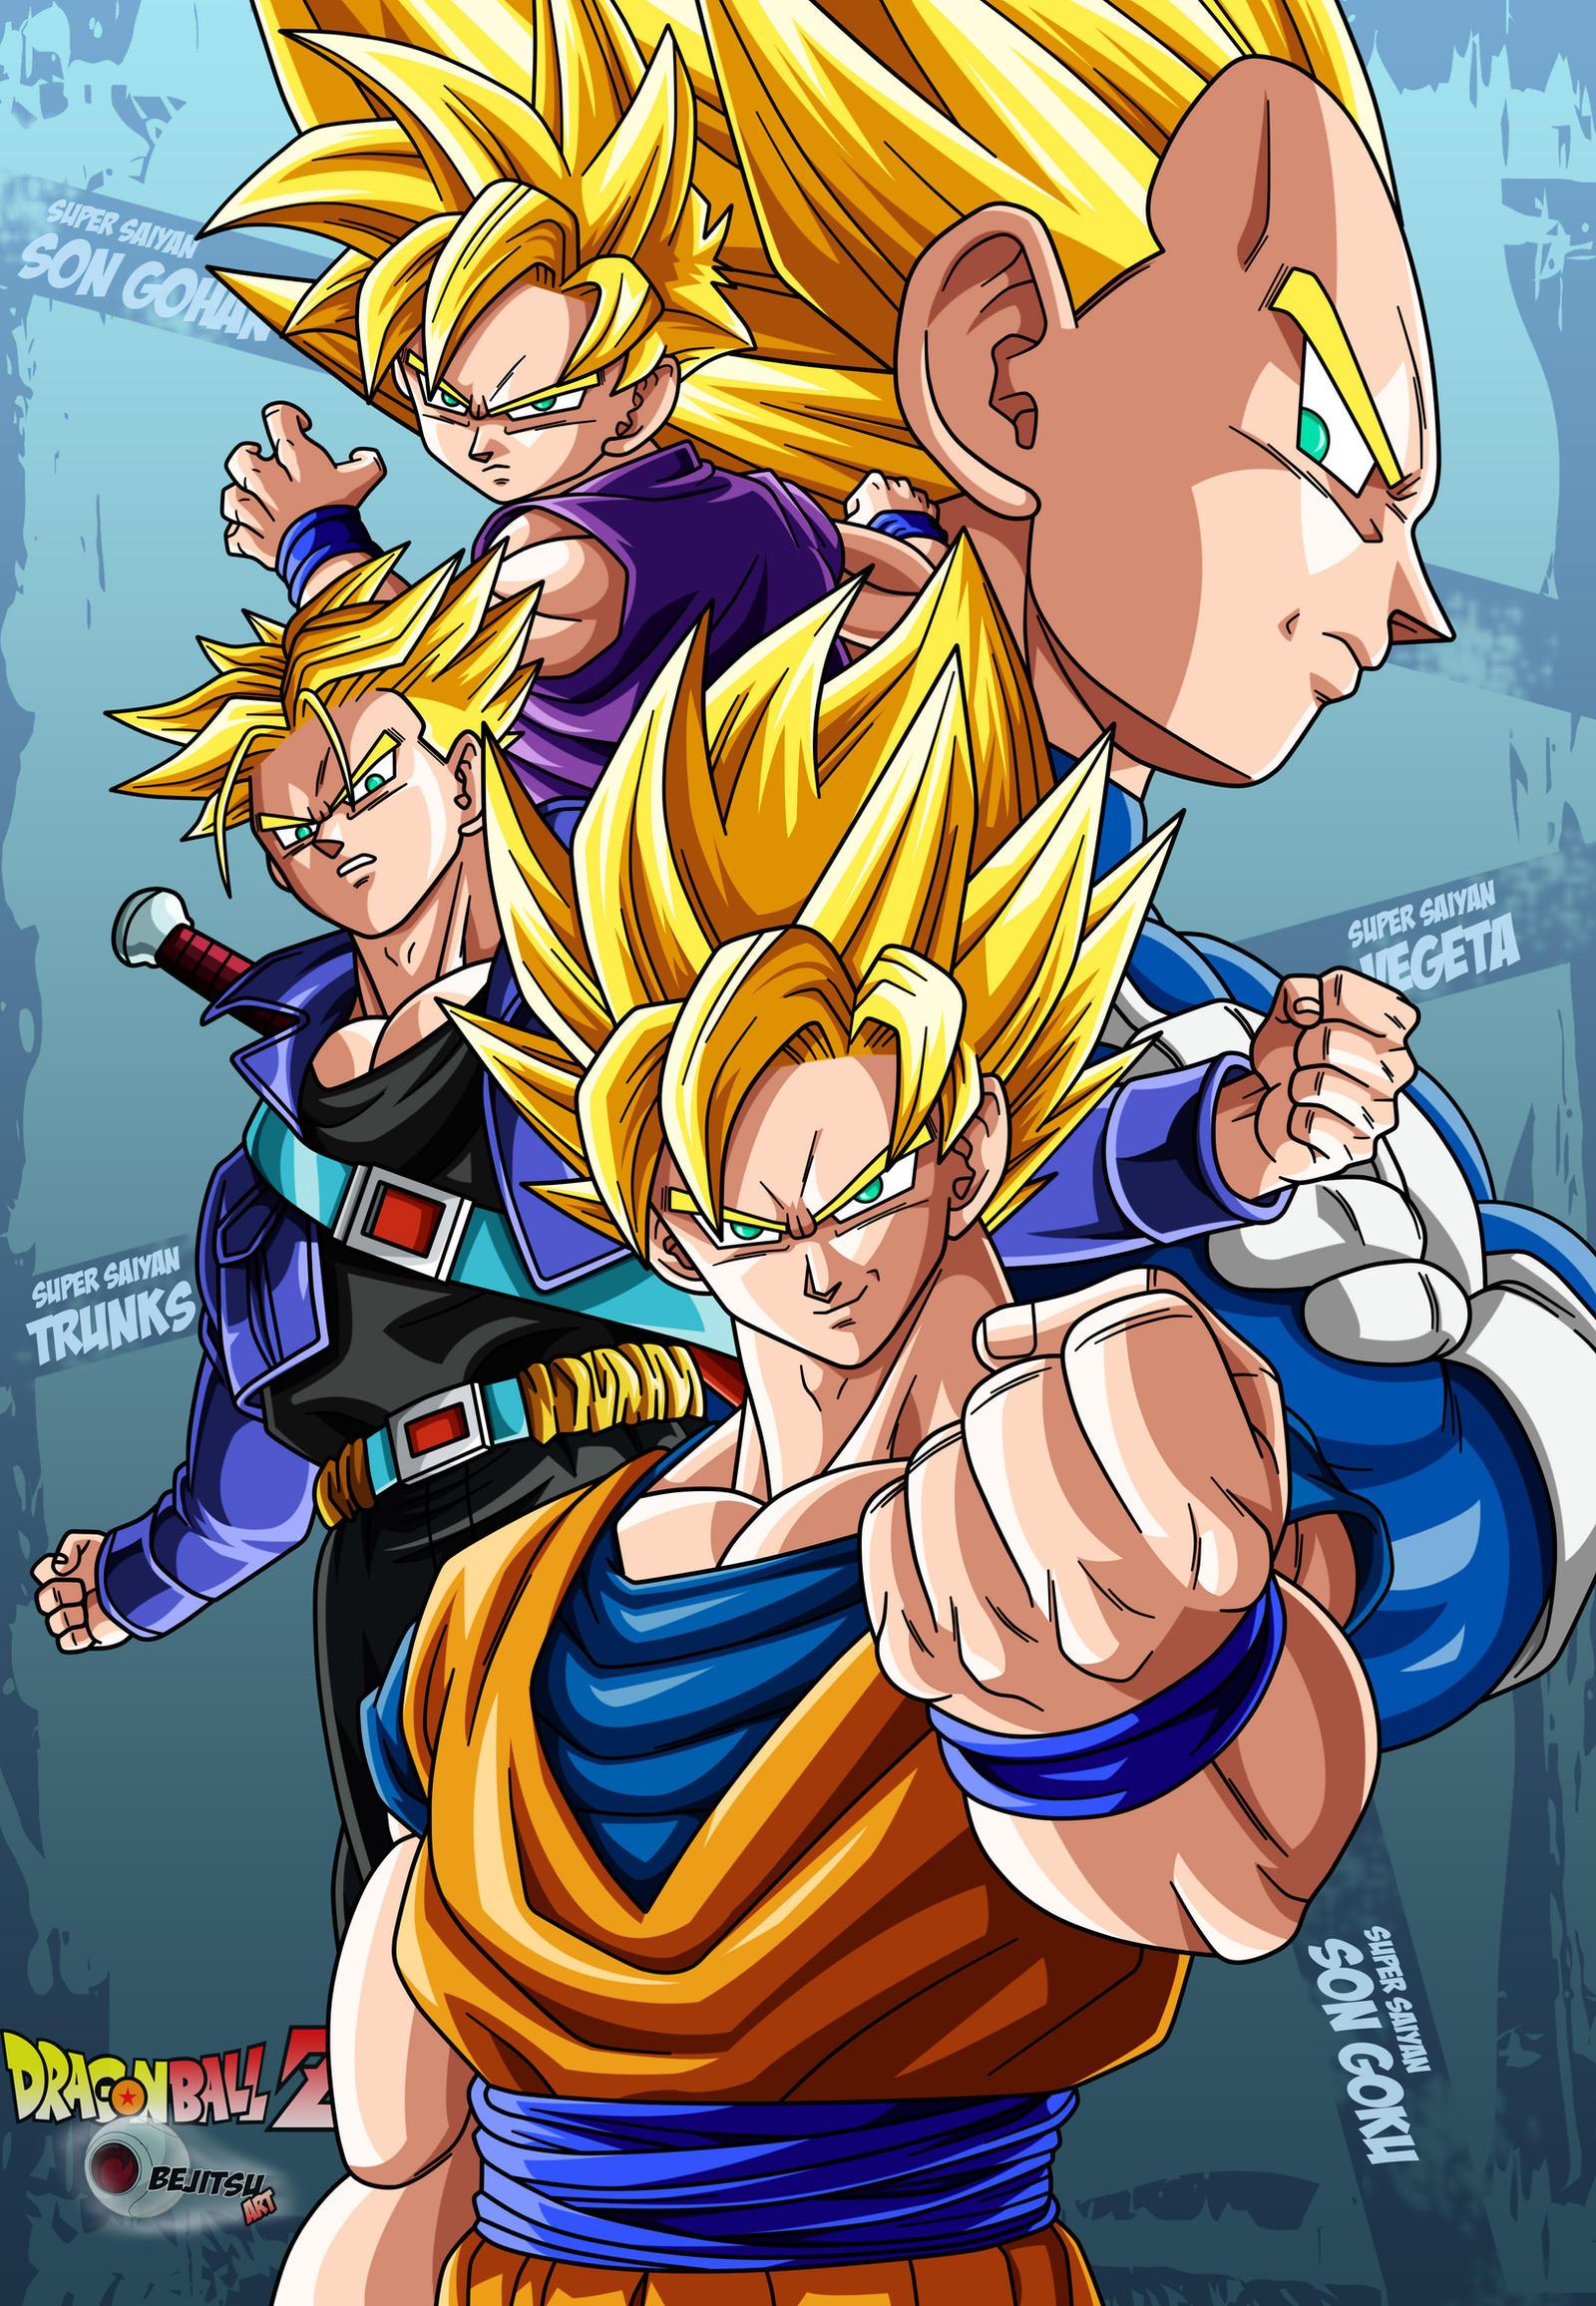 the 4 super saiyans by Bejitsu